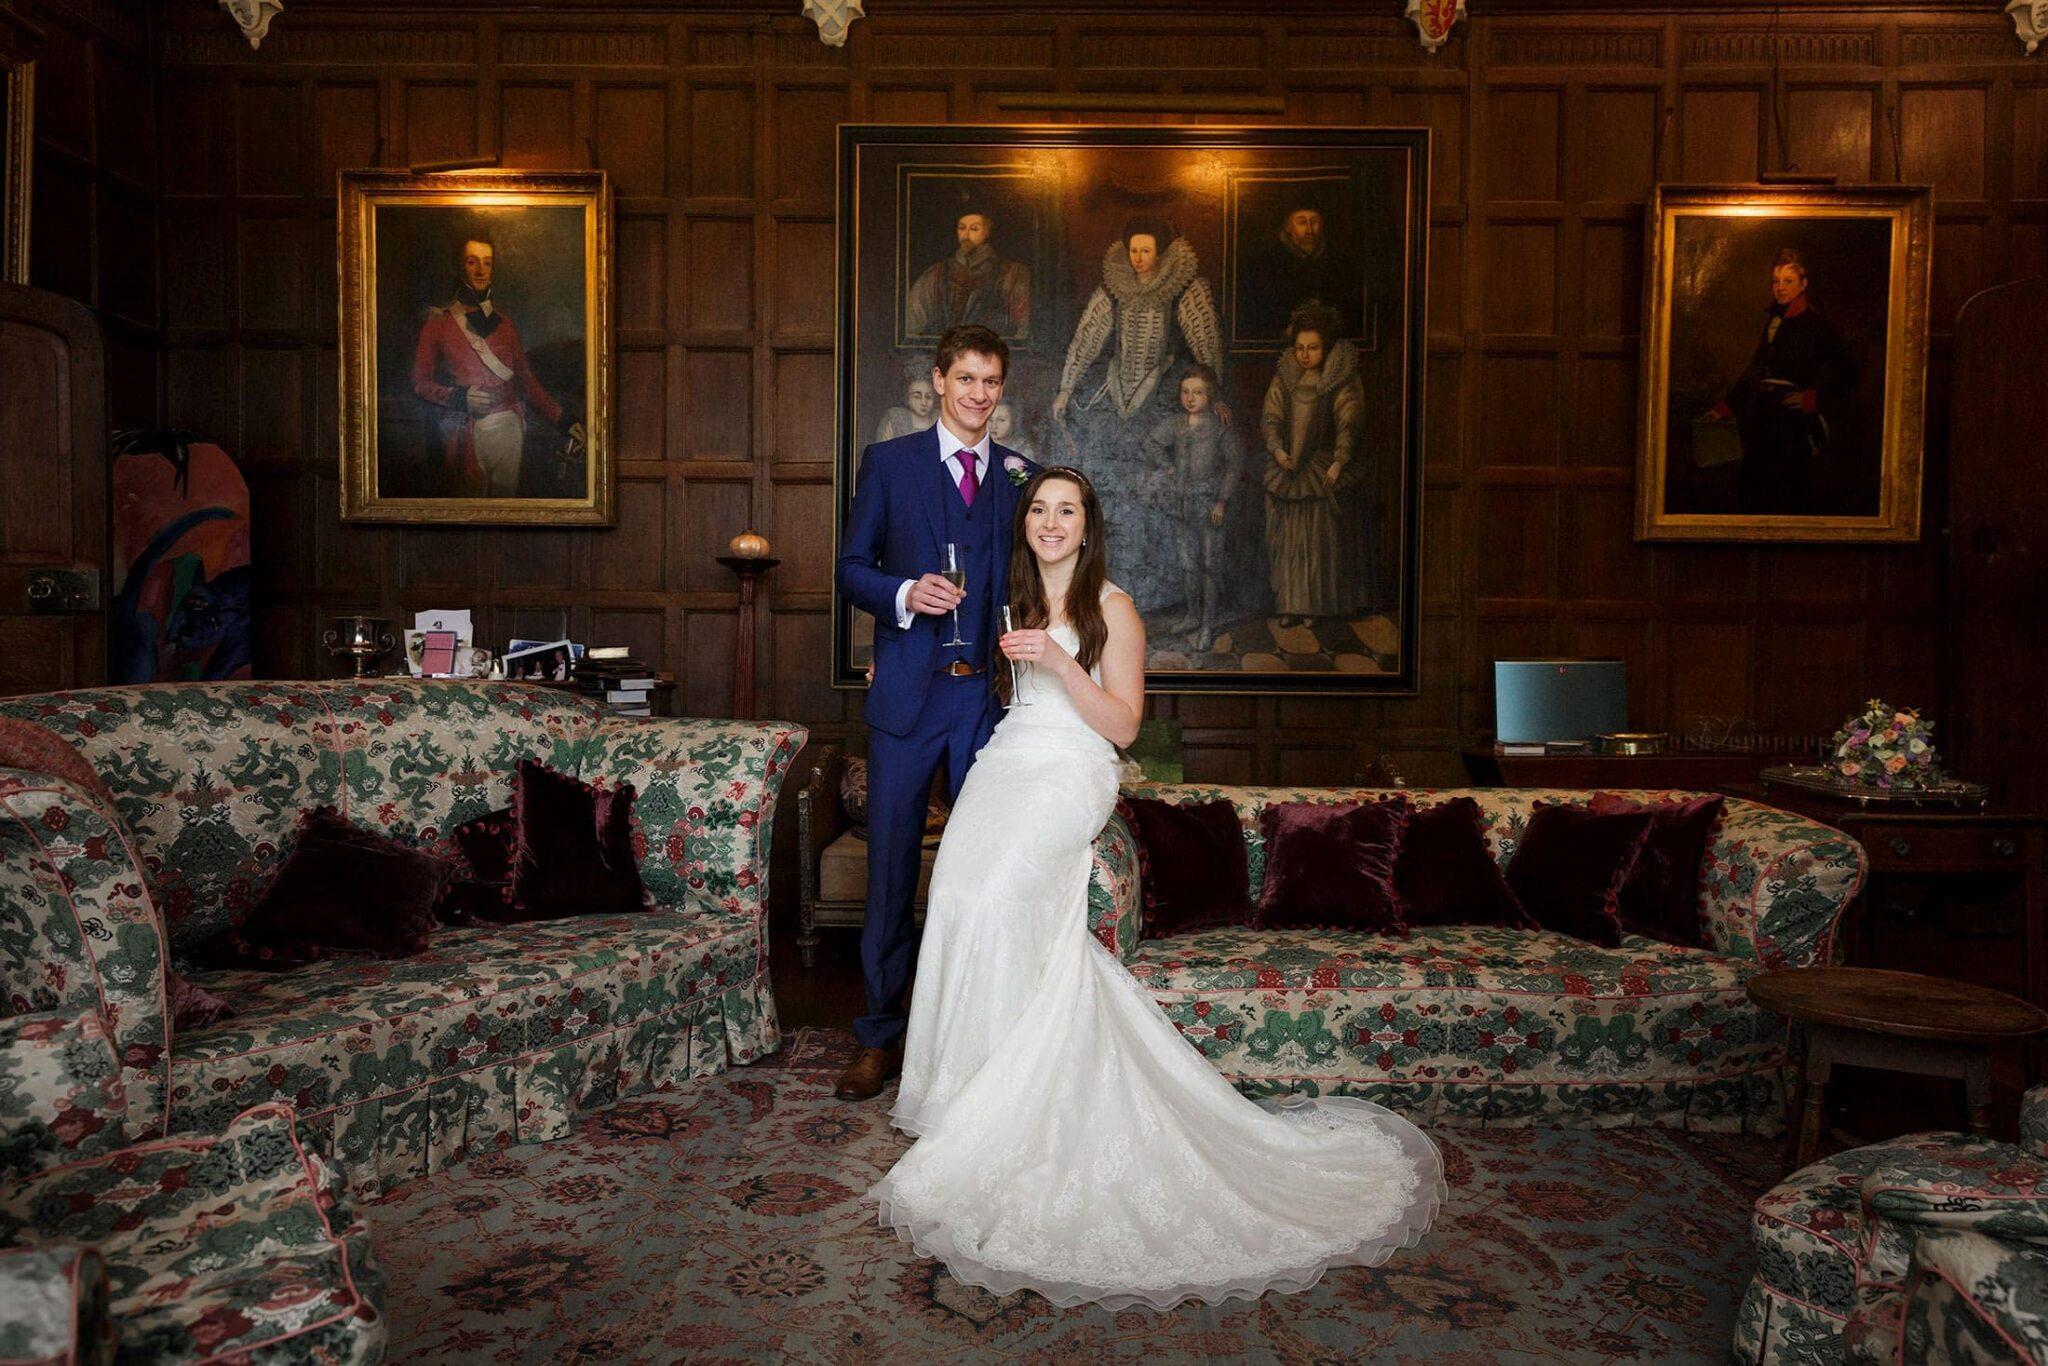 Nether Winchendon spring wedding of Joy & Phil